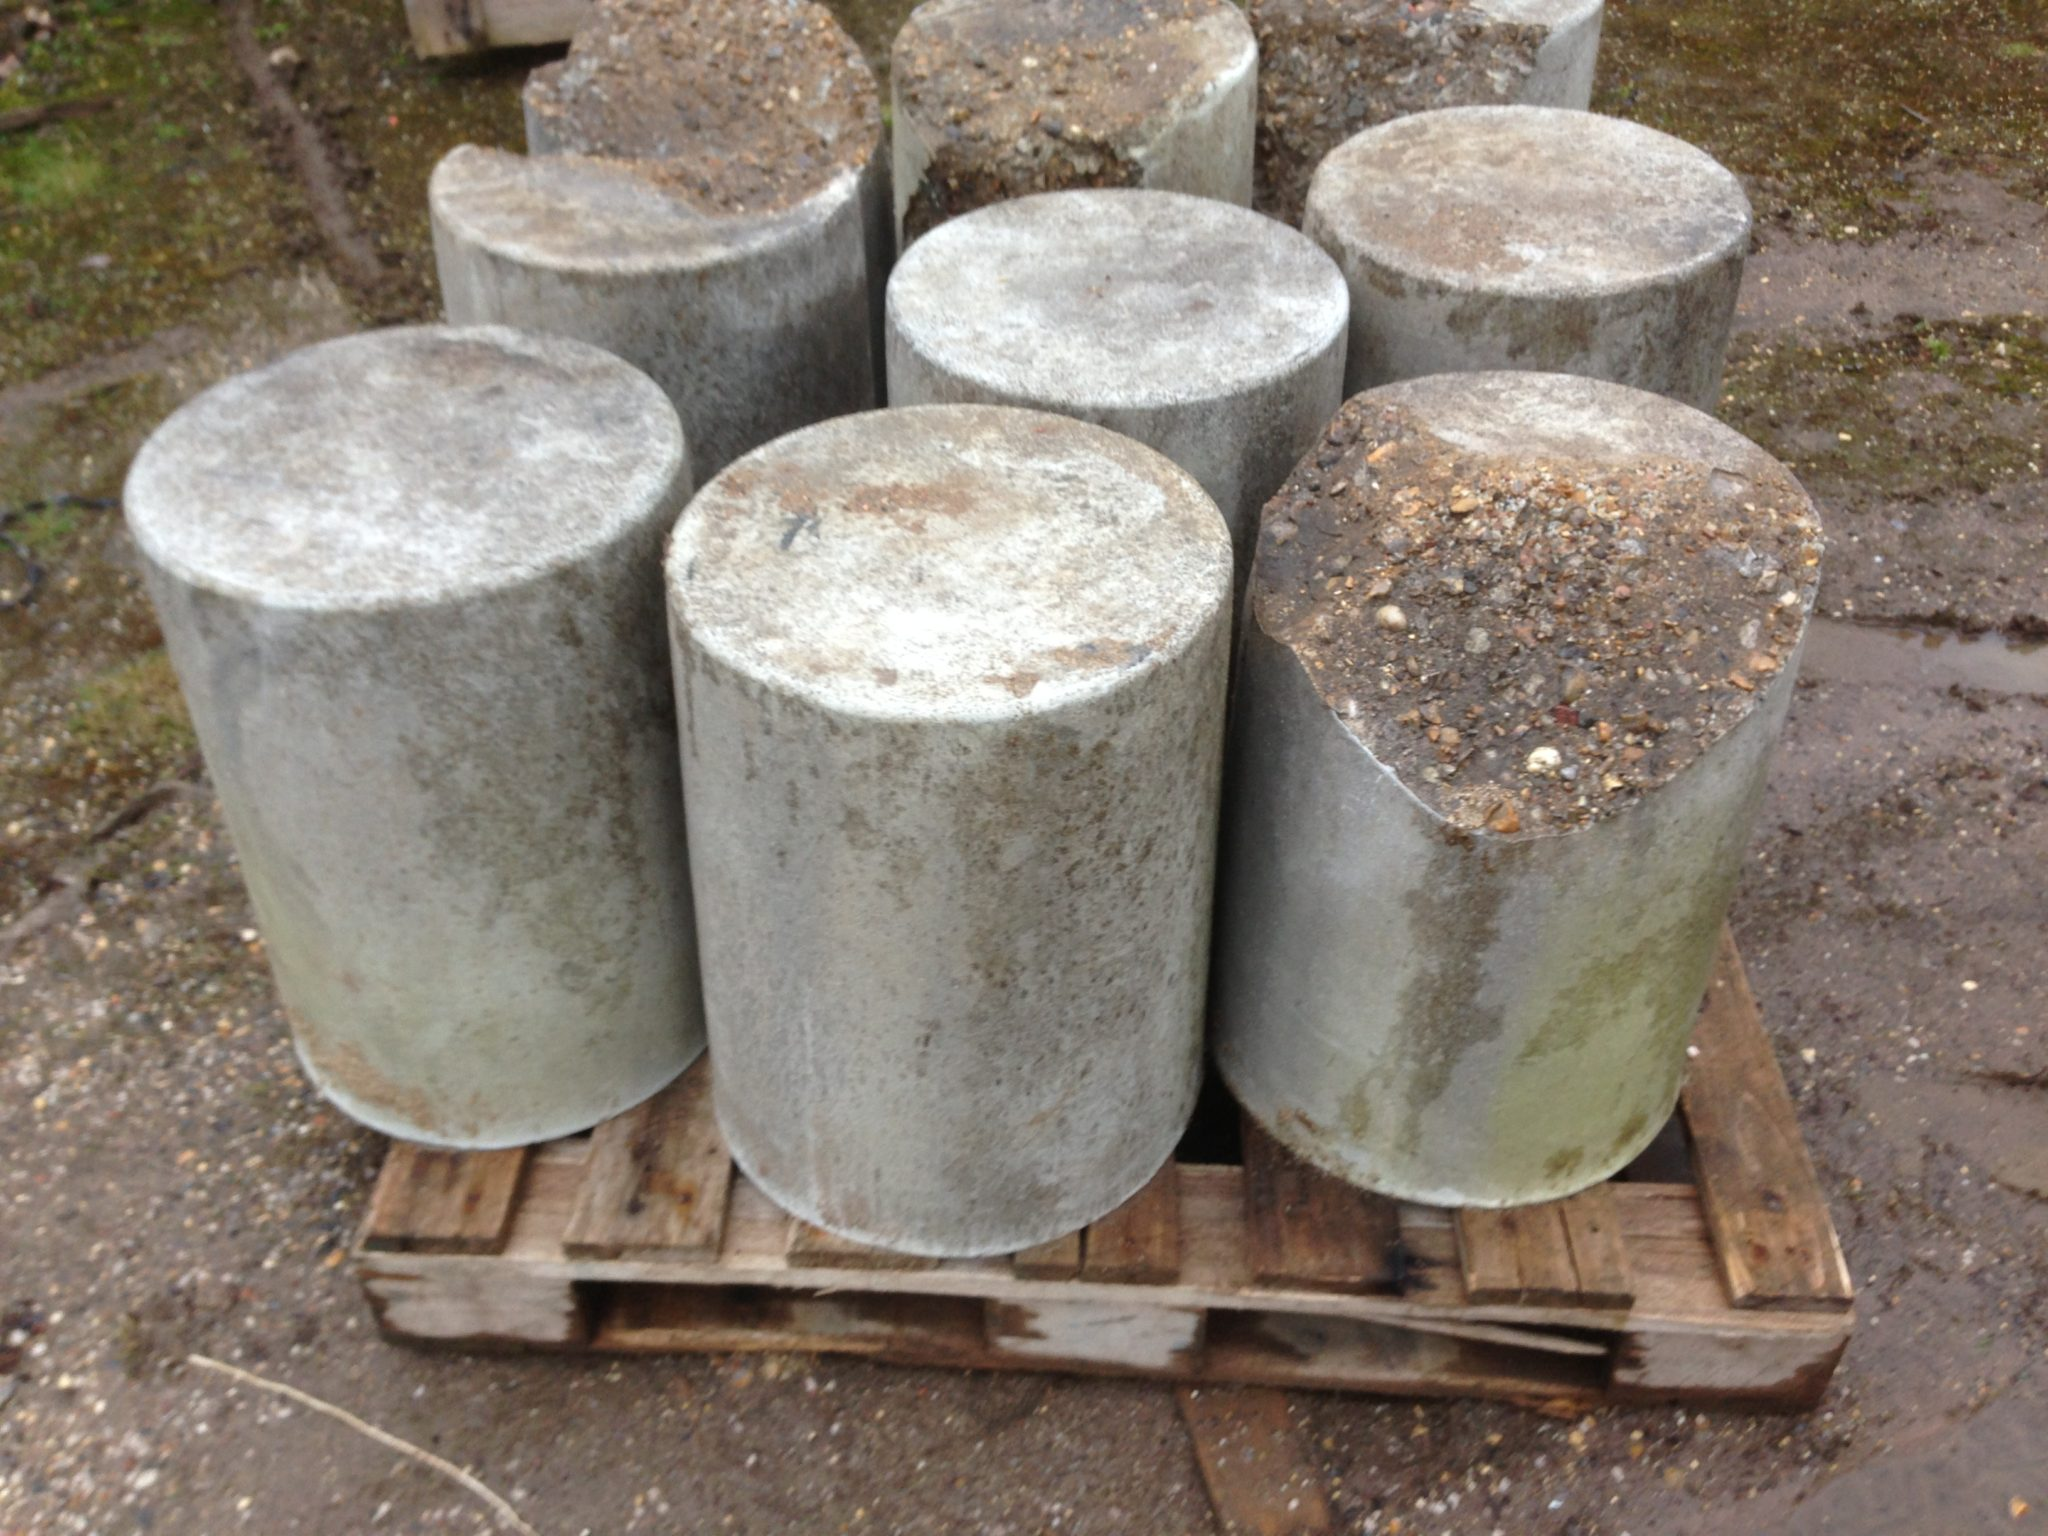 Concrete Bollards Fake 4 Complete 4 Broken - Fake Concrete Bollards